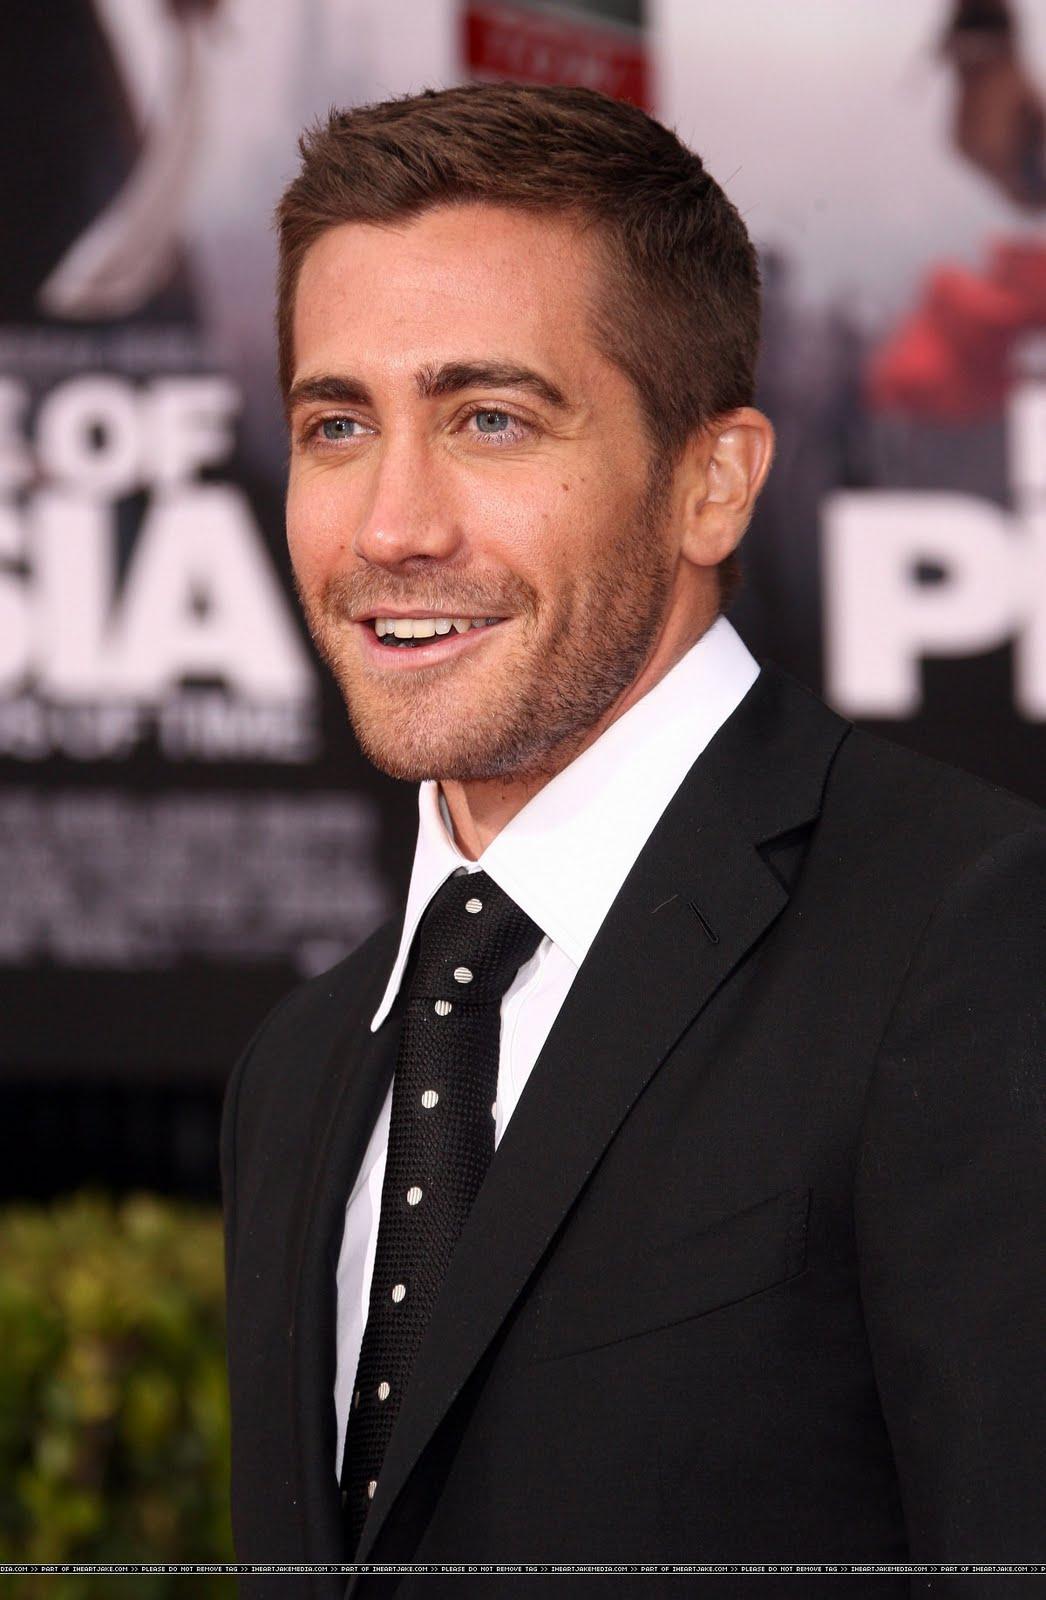 http://4.bp.blogspot.com/_YcsRkF6yBLI/S_P35AsuudI/AAAAAAAAKjA/5qTmSpOjiaI/s1600/Jake+PoP+LA+Premiere+Smiling+headshot+139.jpg